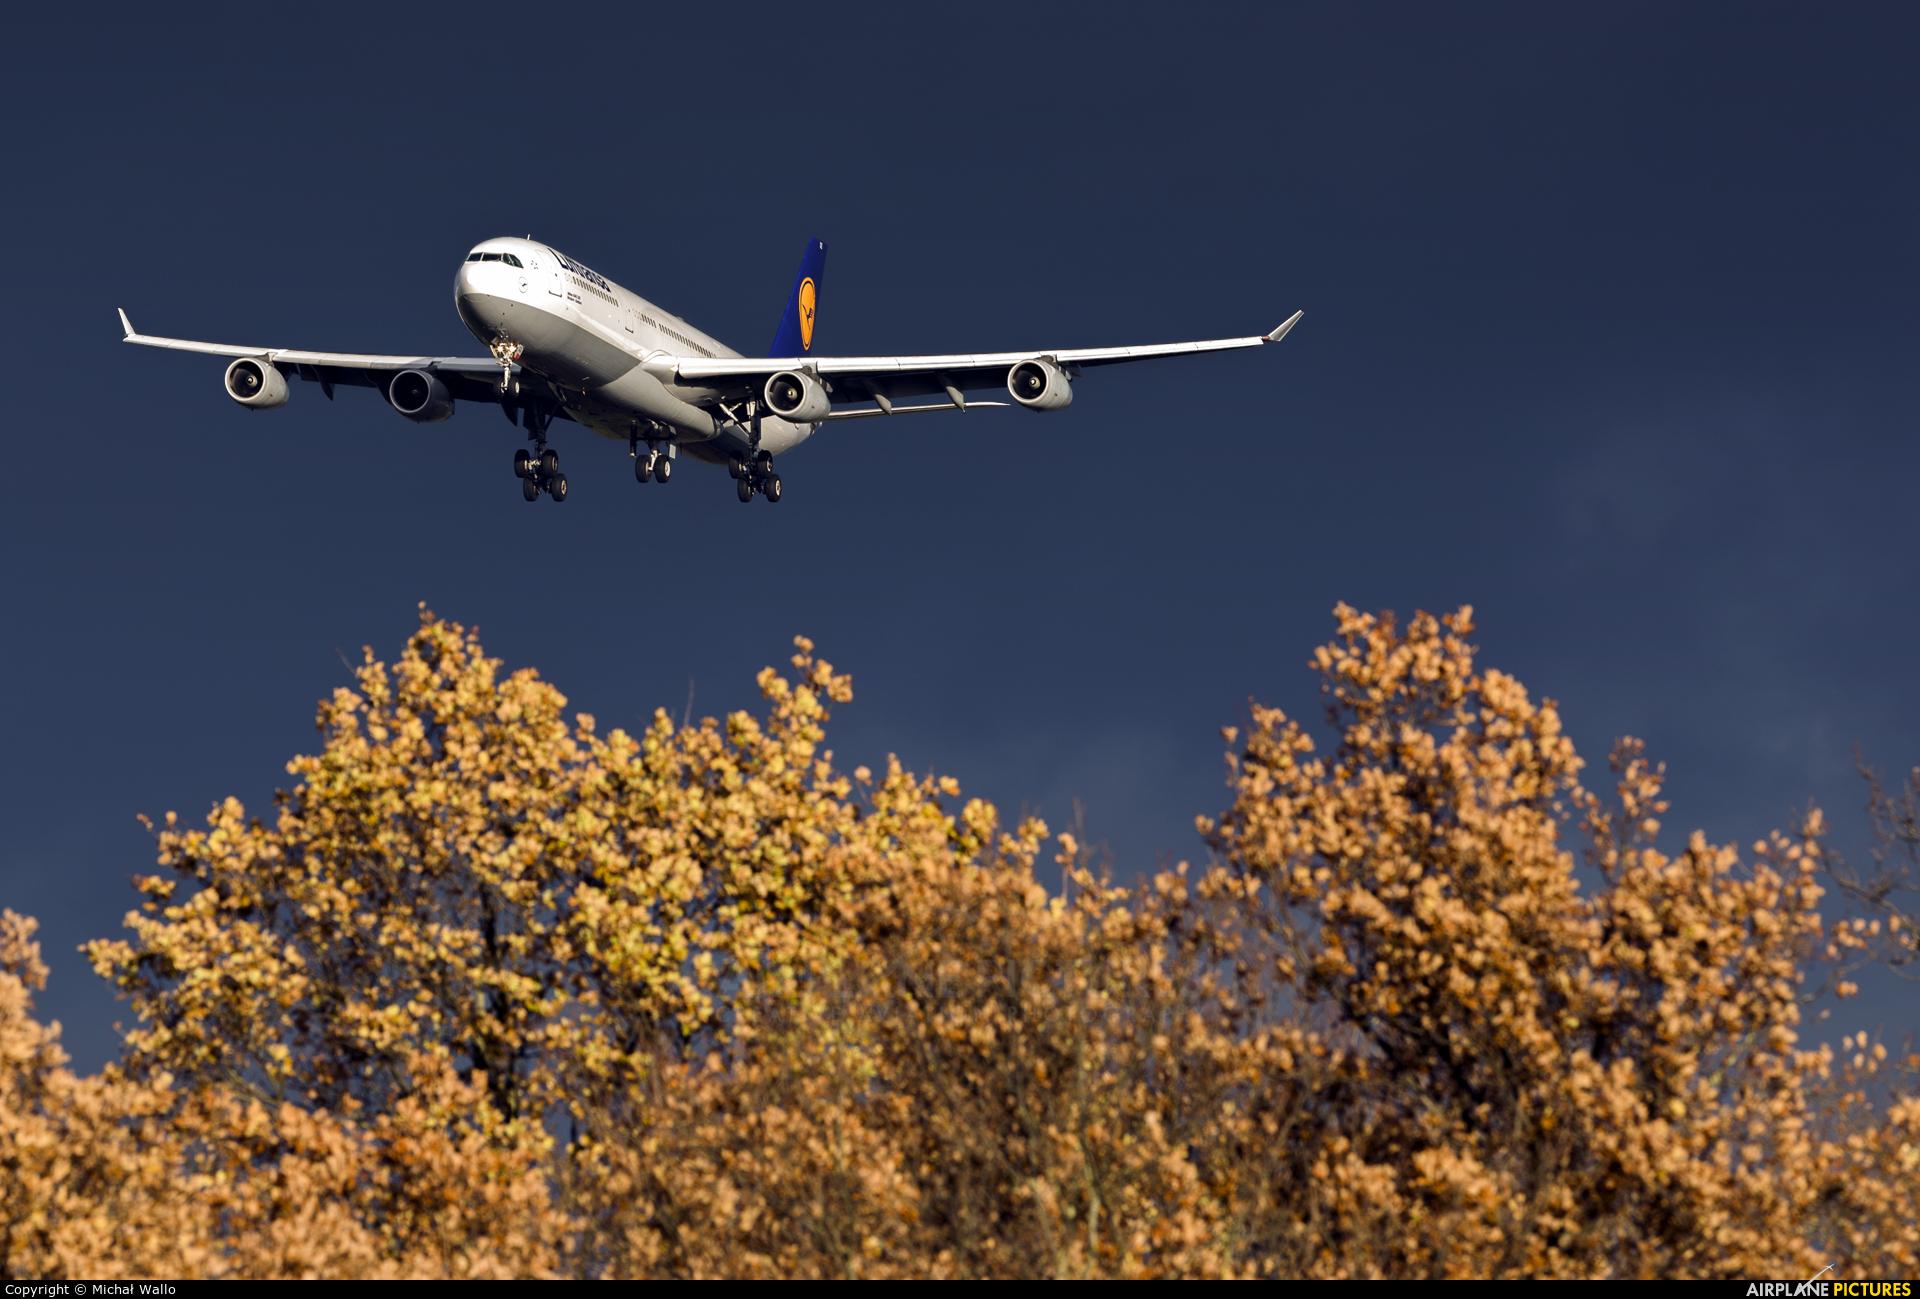 Lufthansa D-AIGS aircraft at Frankfurt